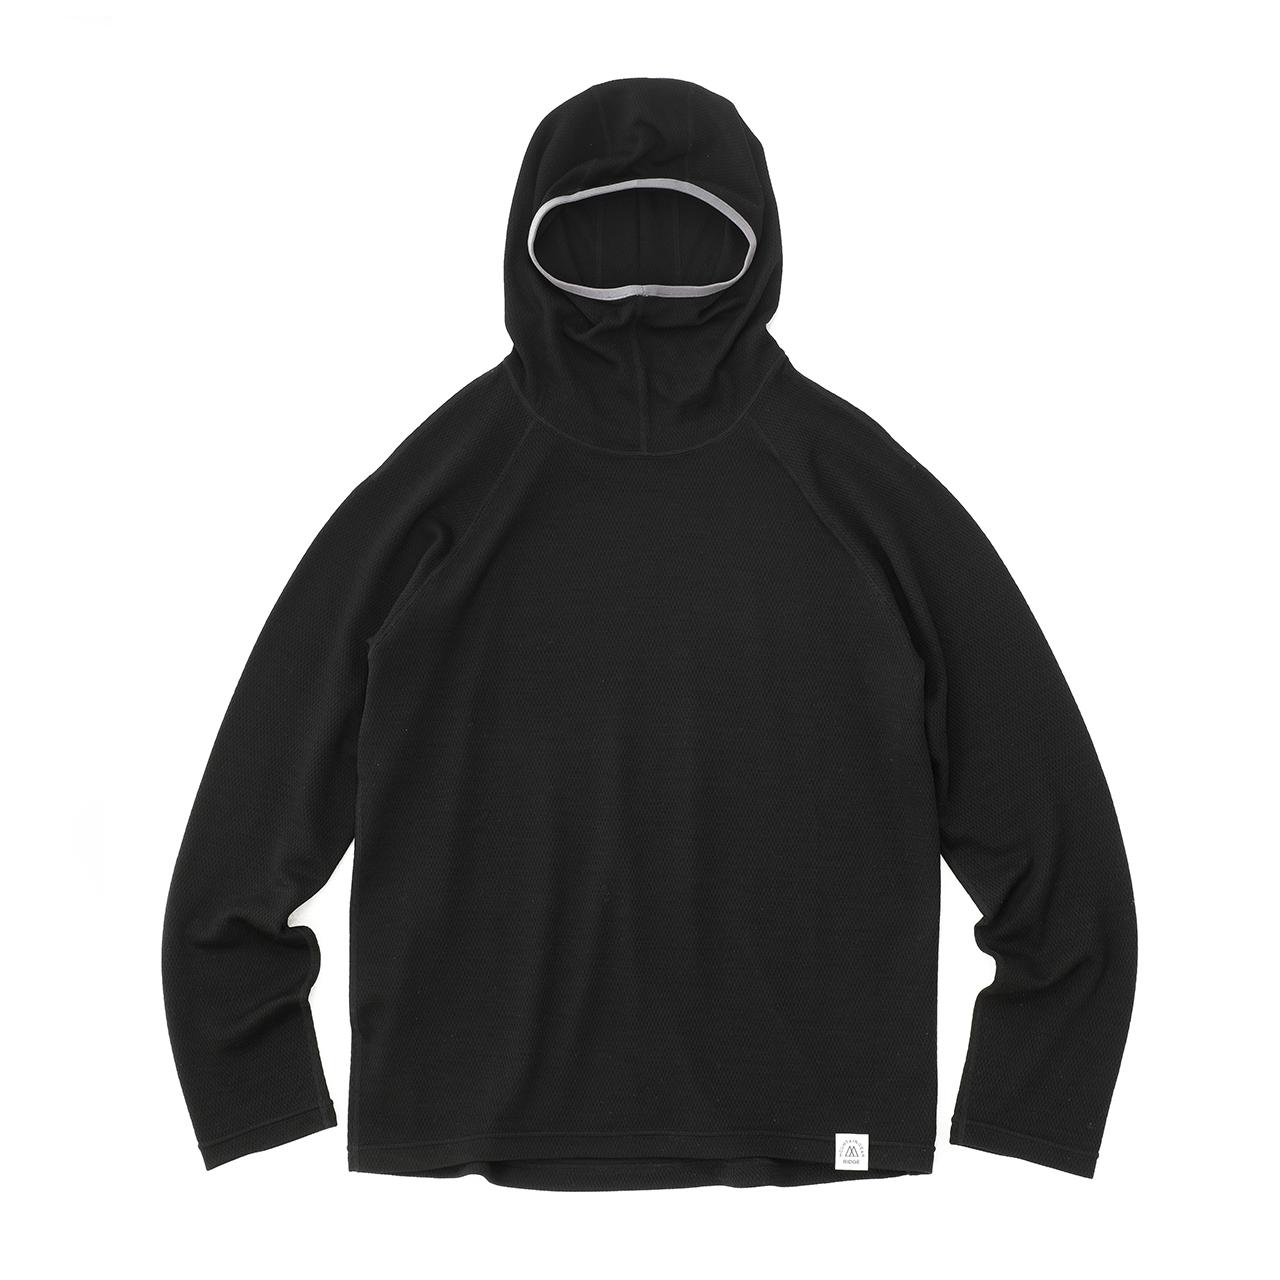 Test Product『Mesh Merino Pullover Hoodie』